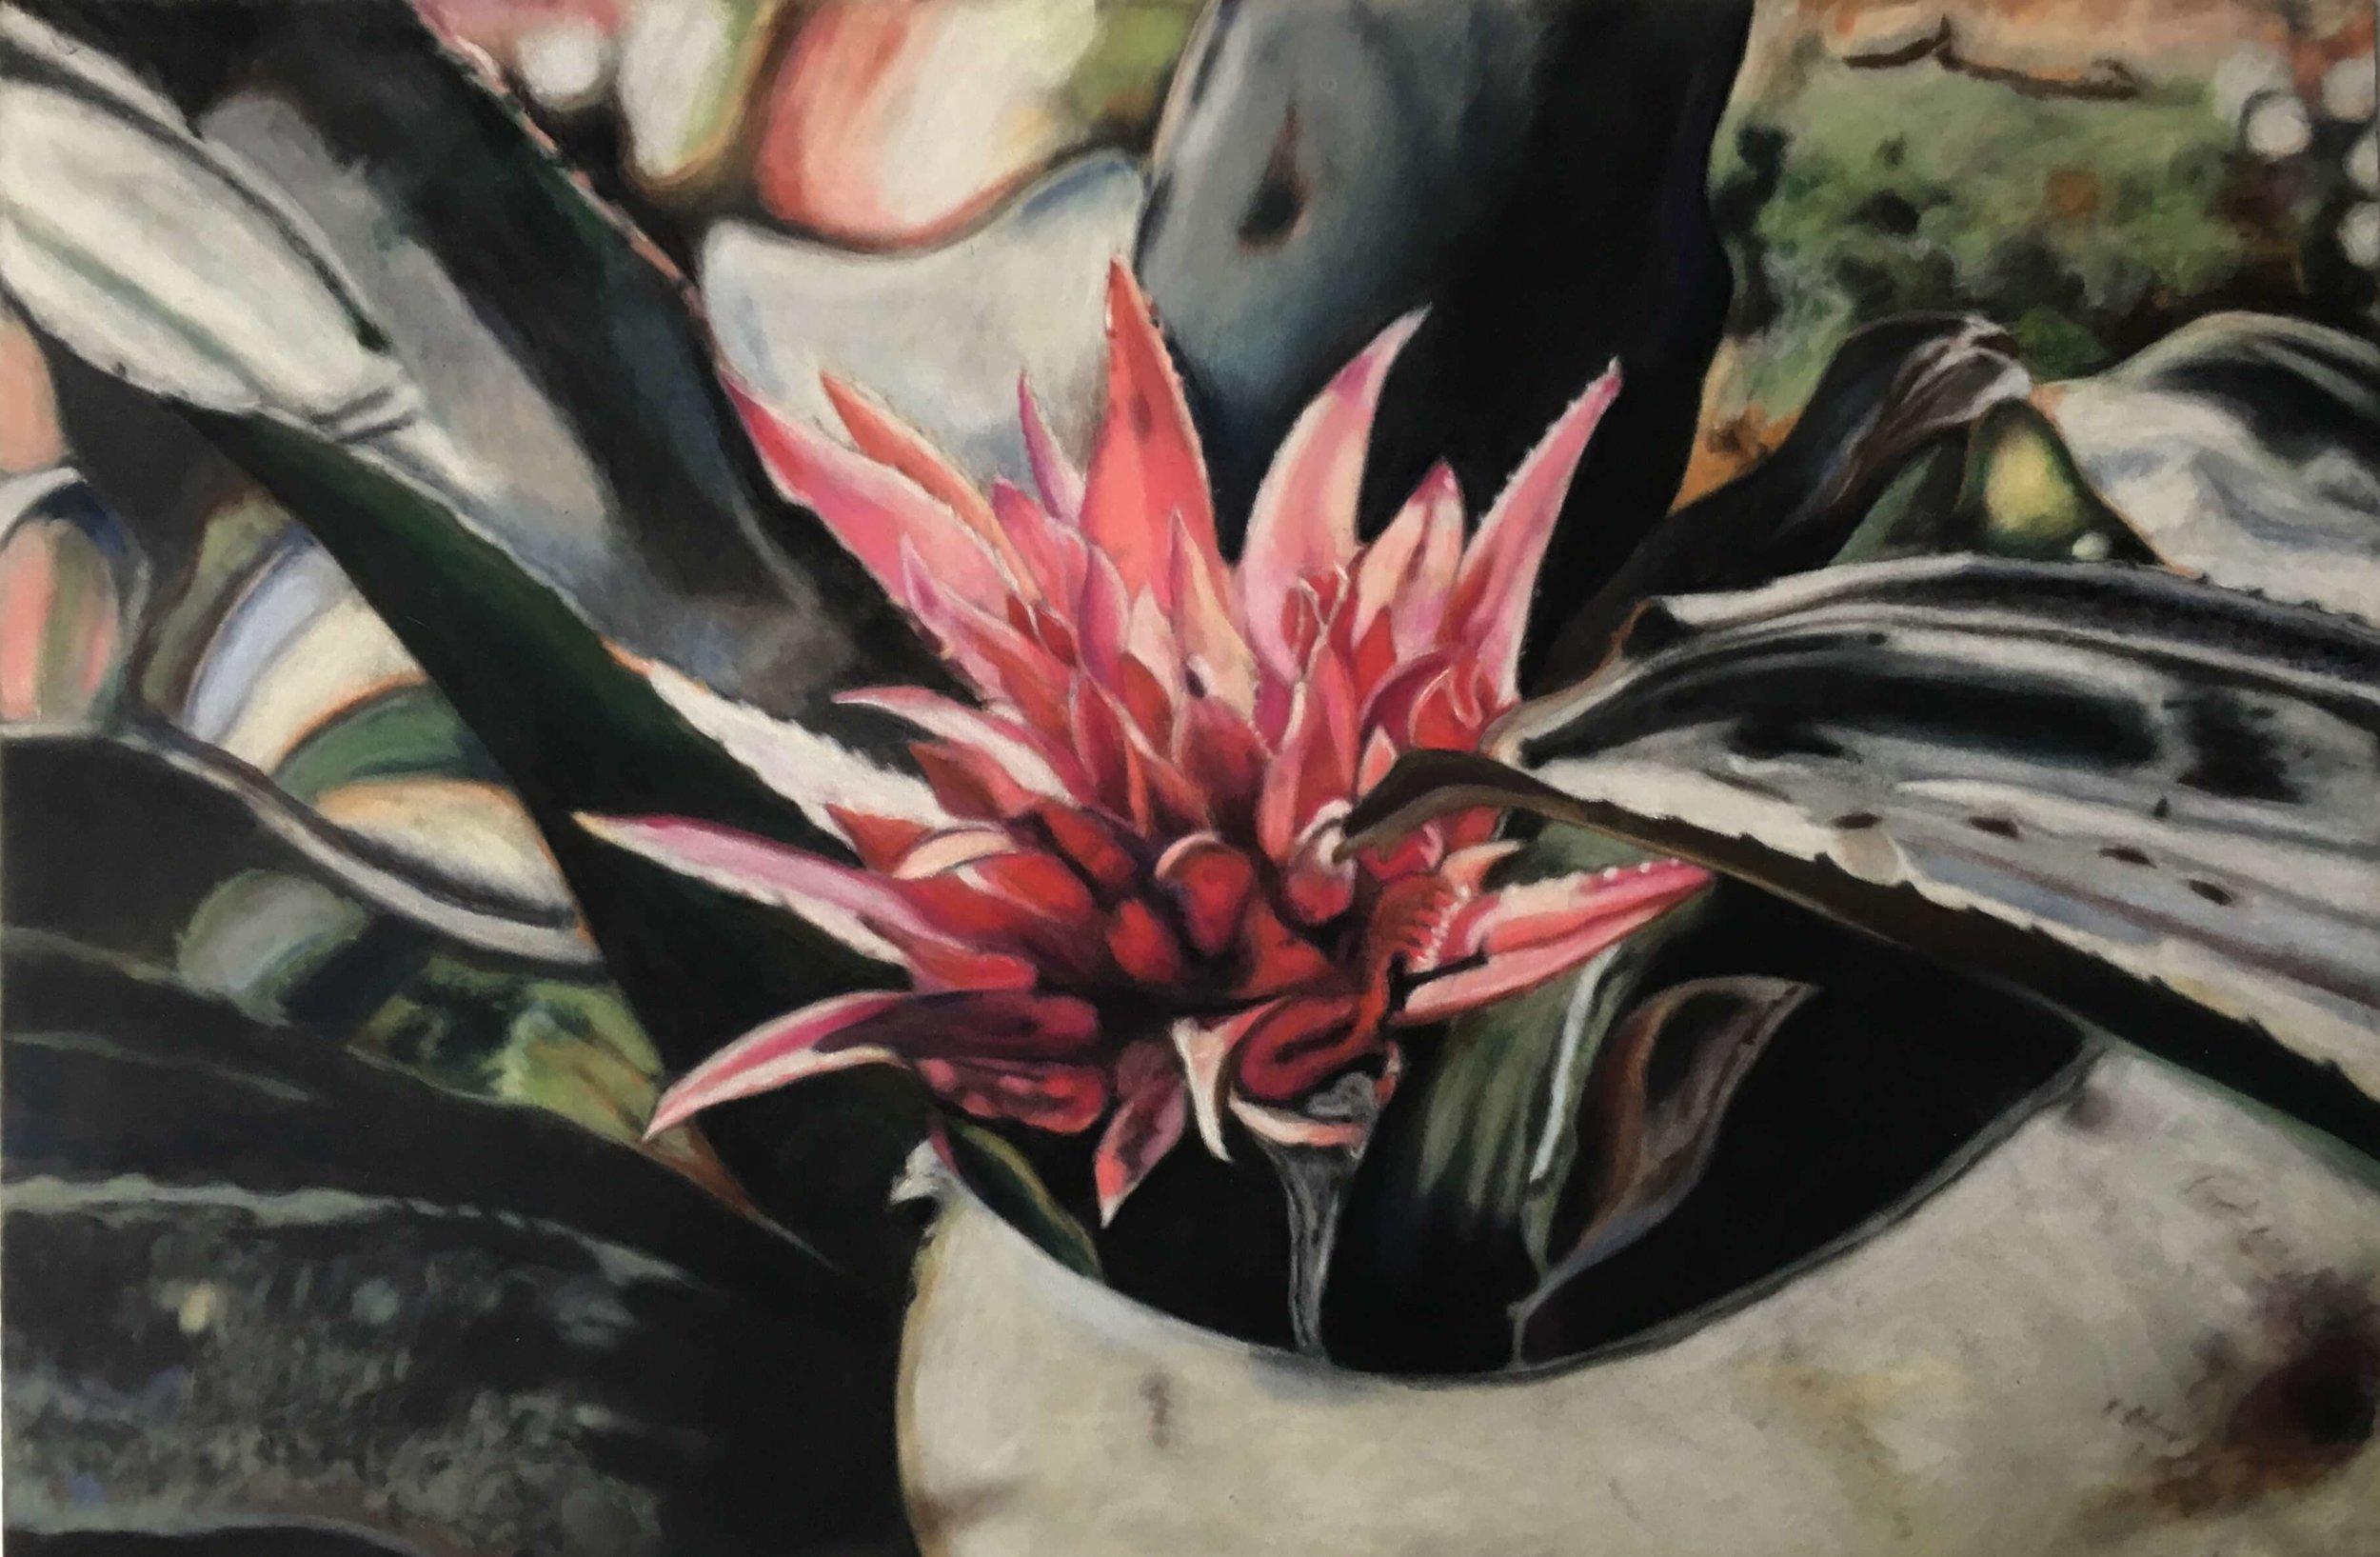 Aechmea, Ute Latzke, Pastellkreide auf Velour und MDF, 60x40x1 cm, 2017, Preis: 600,-